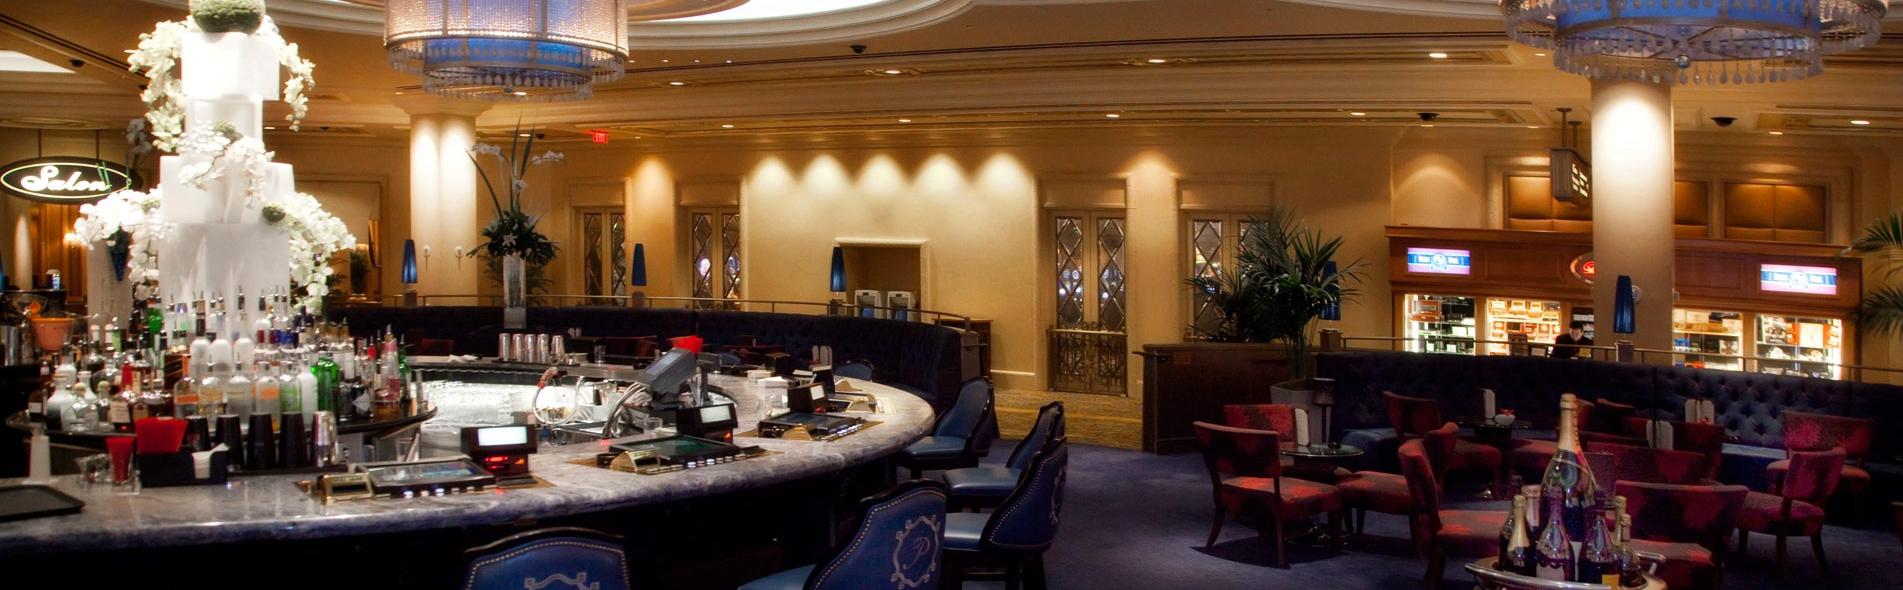 Lauguna Champagne Bar at Palazzo Las Vegas Hotel and Casino